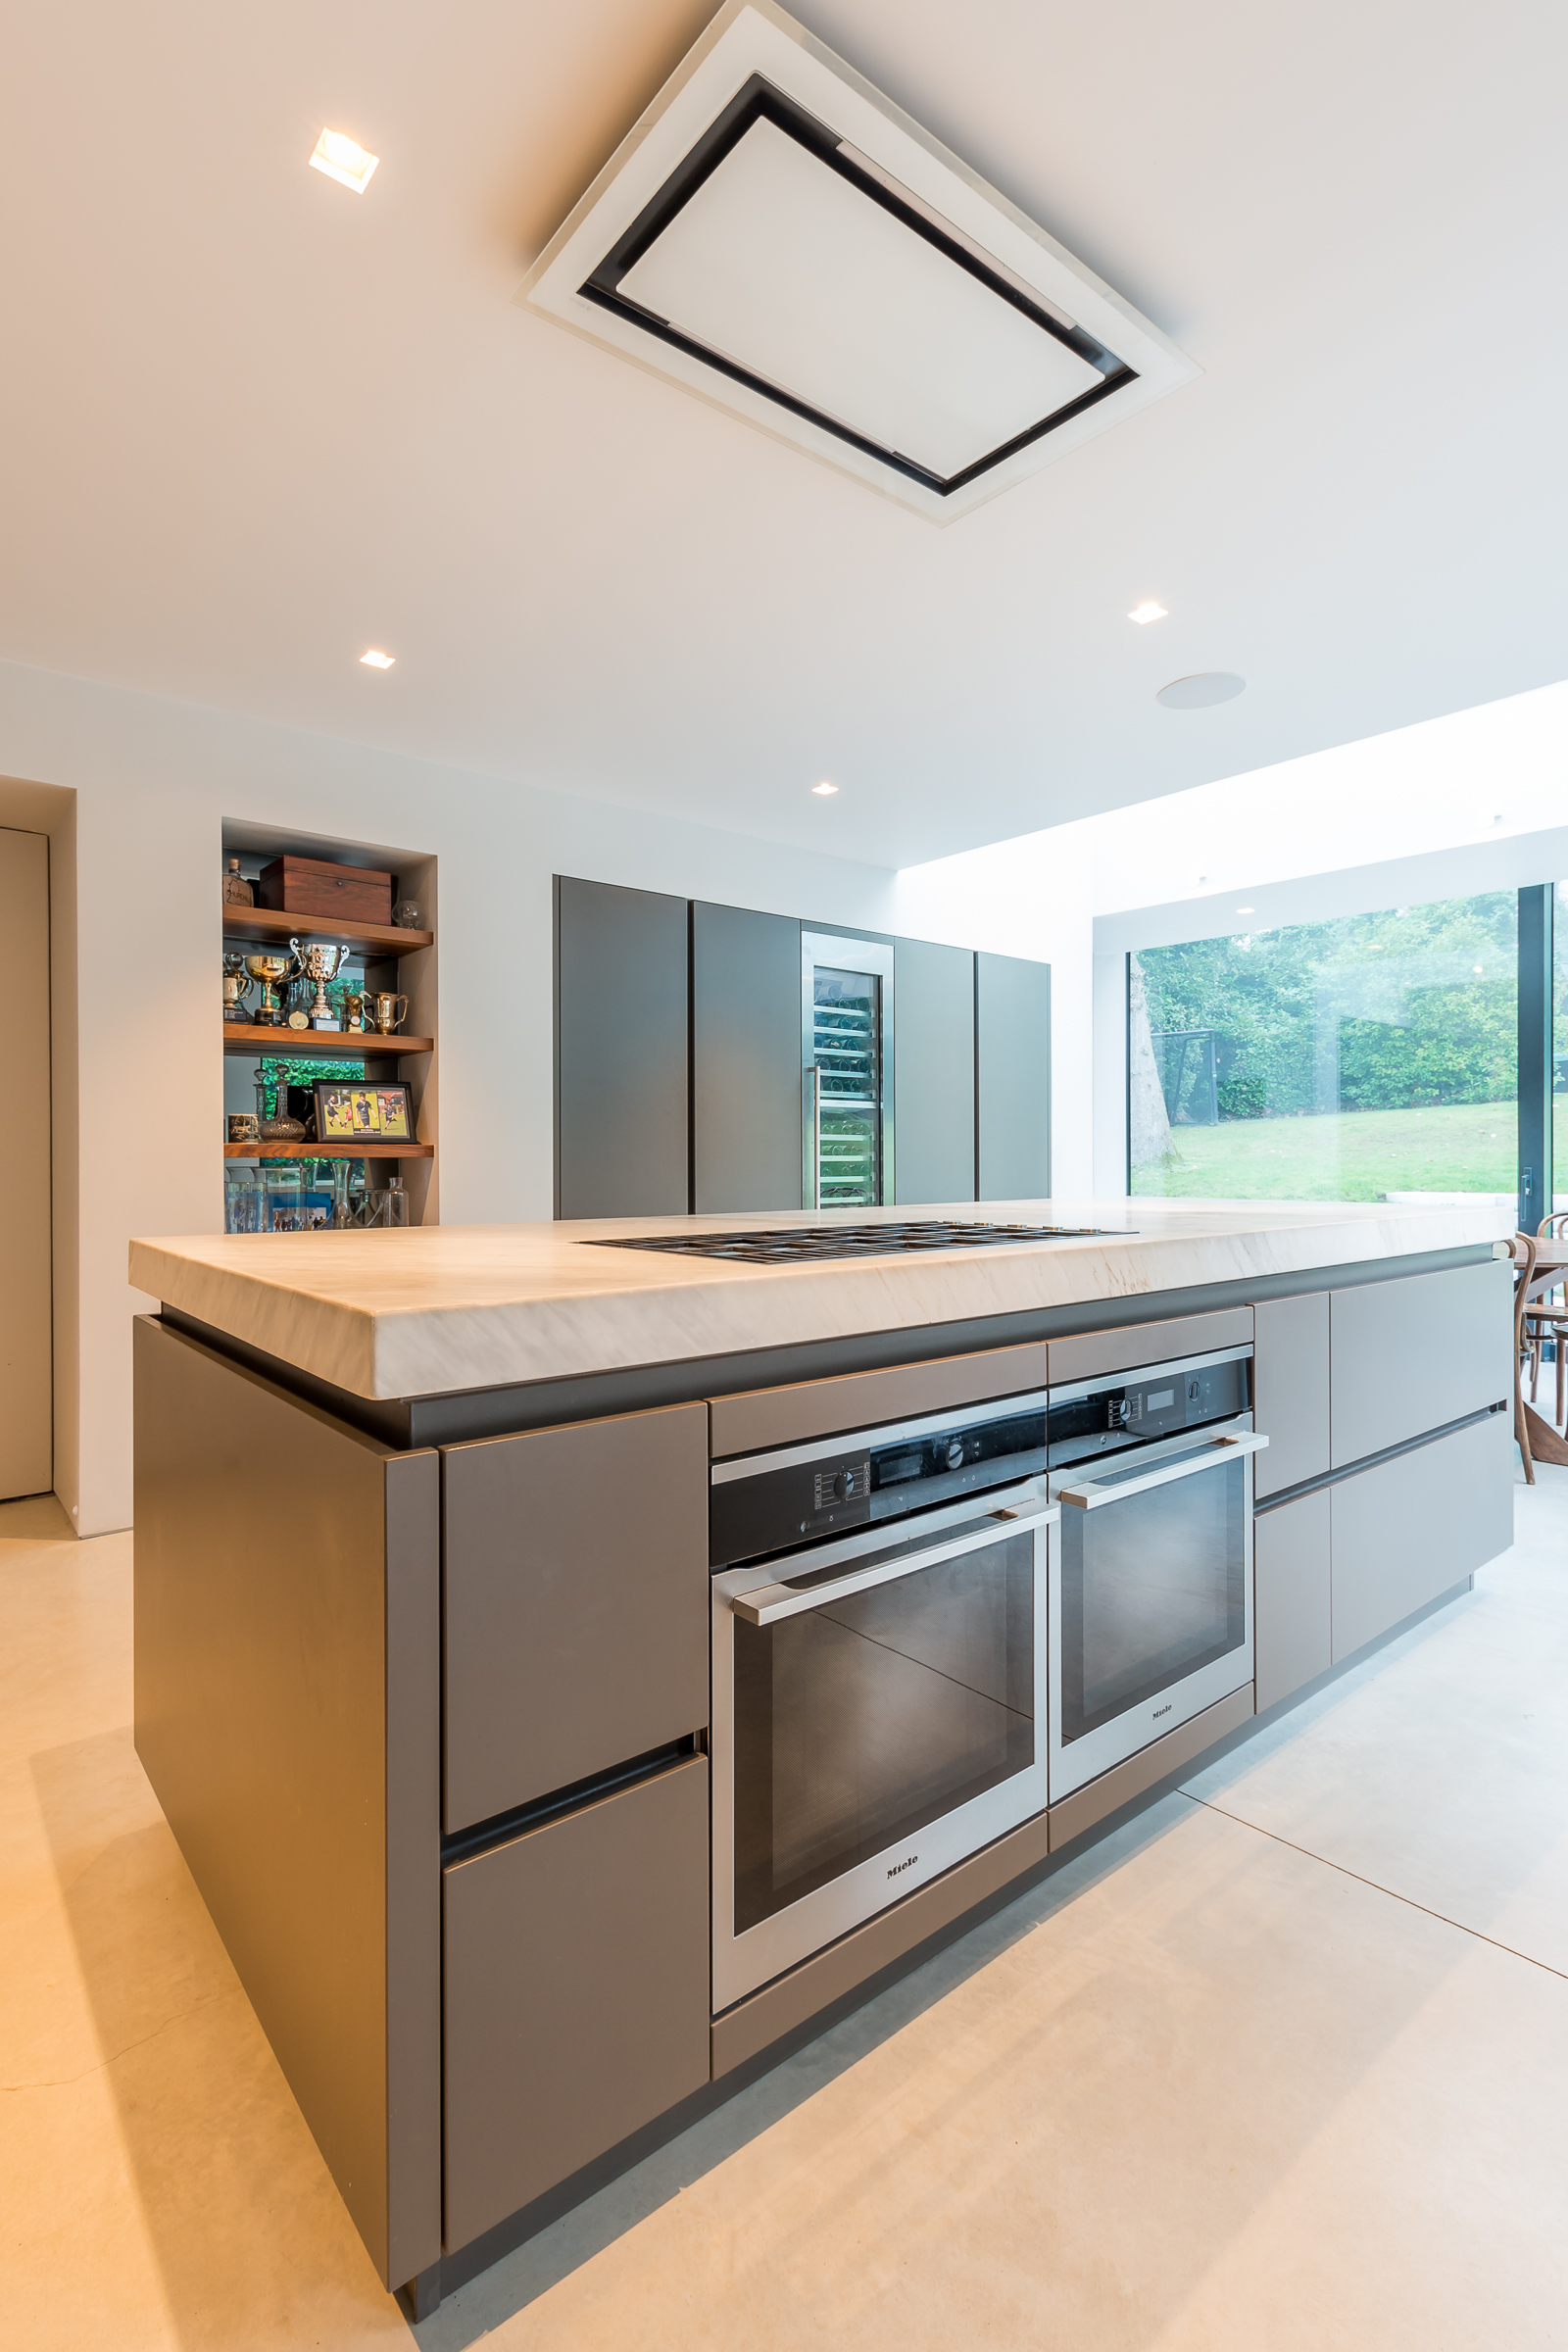 Kitchens for Interior Designers